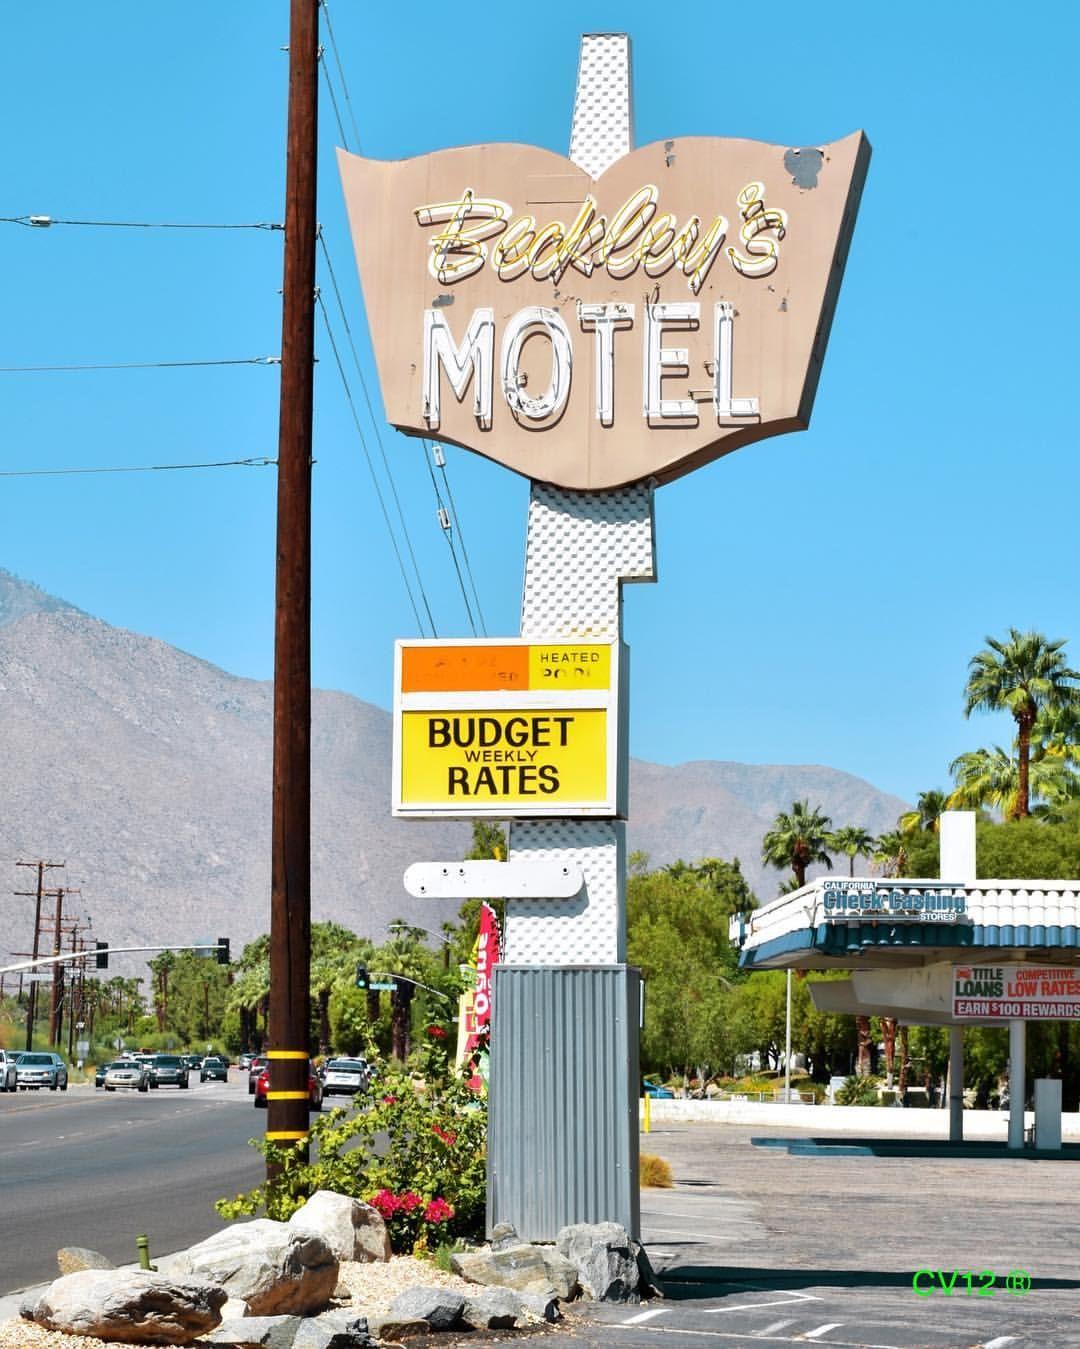 Beckley's Villa Motel was established in 1963. It is